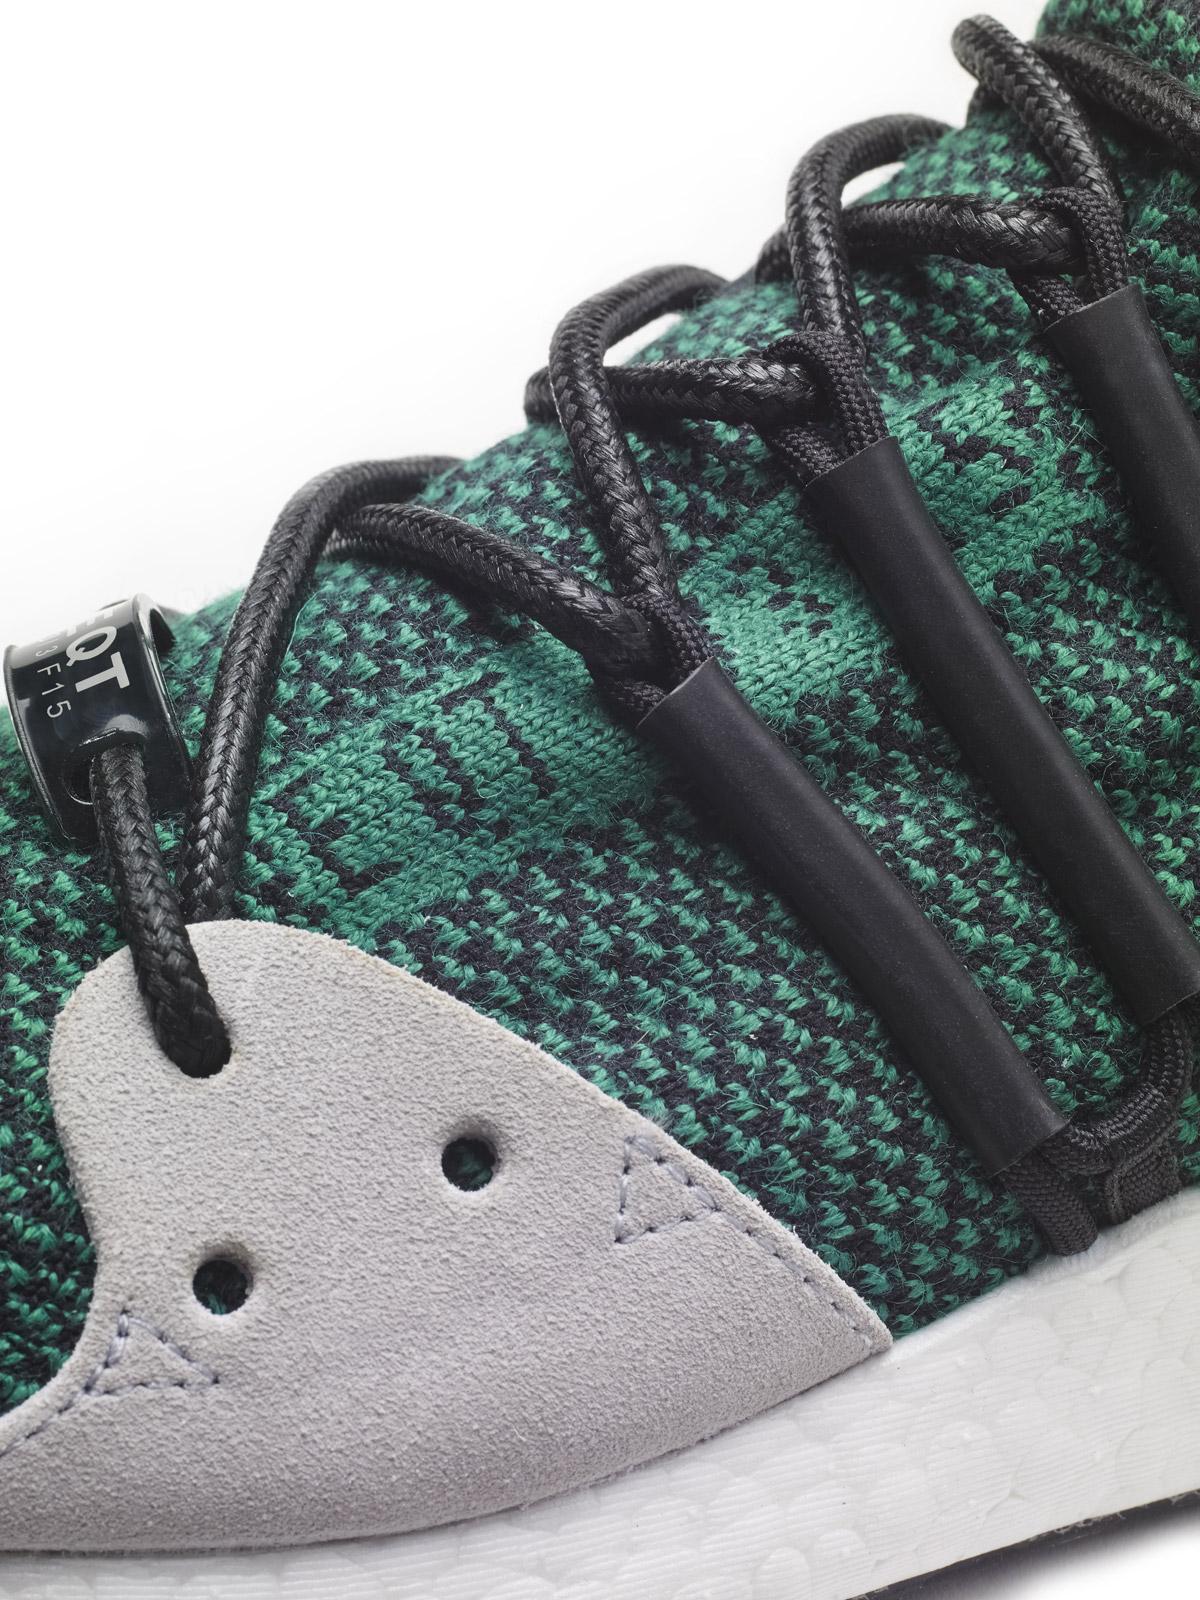 adidas Originals Statement EQT #3F15 Collection-2